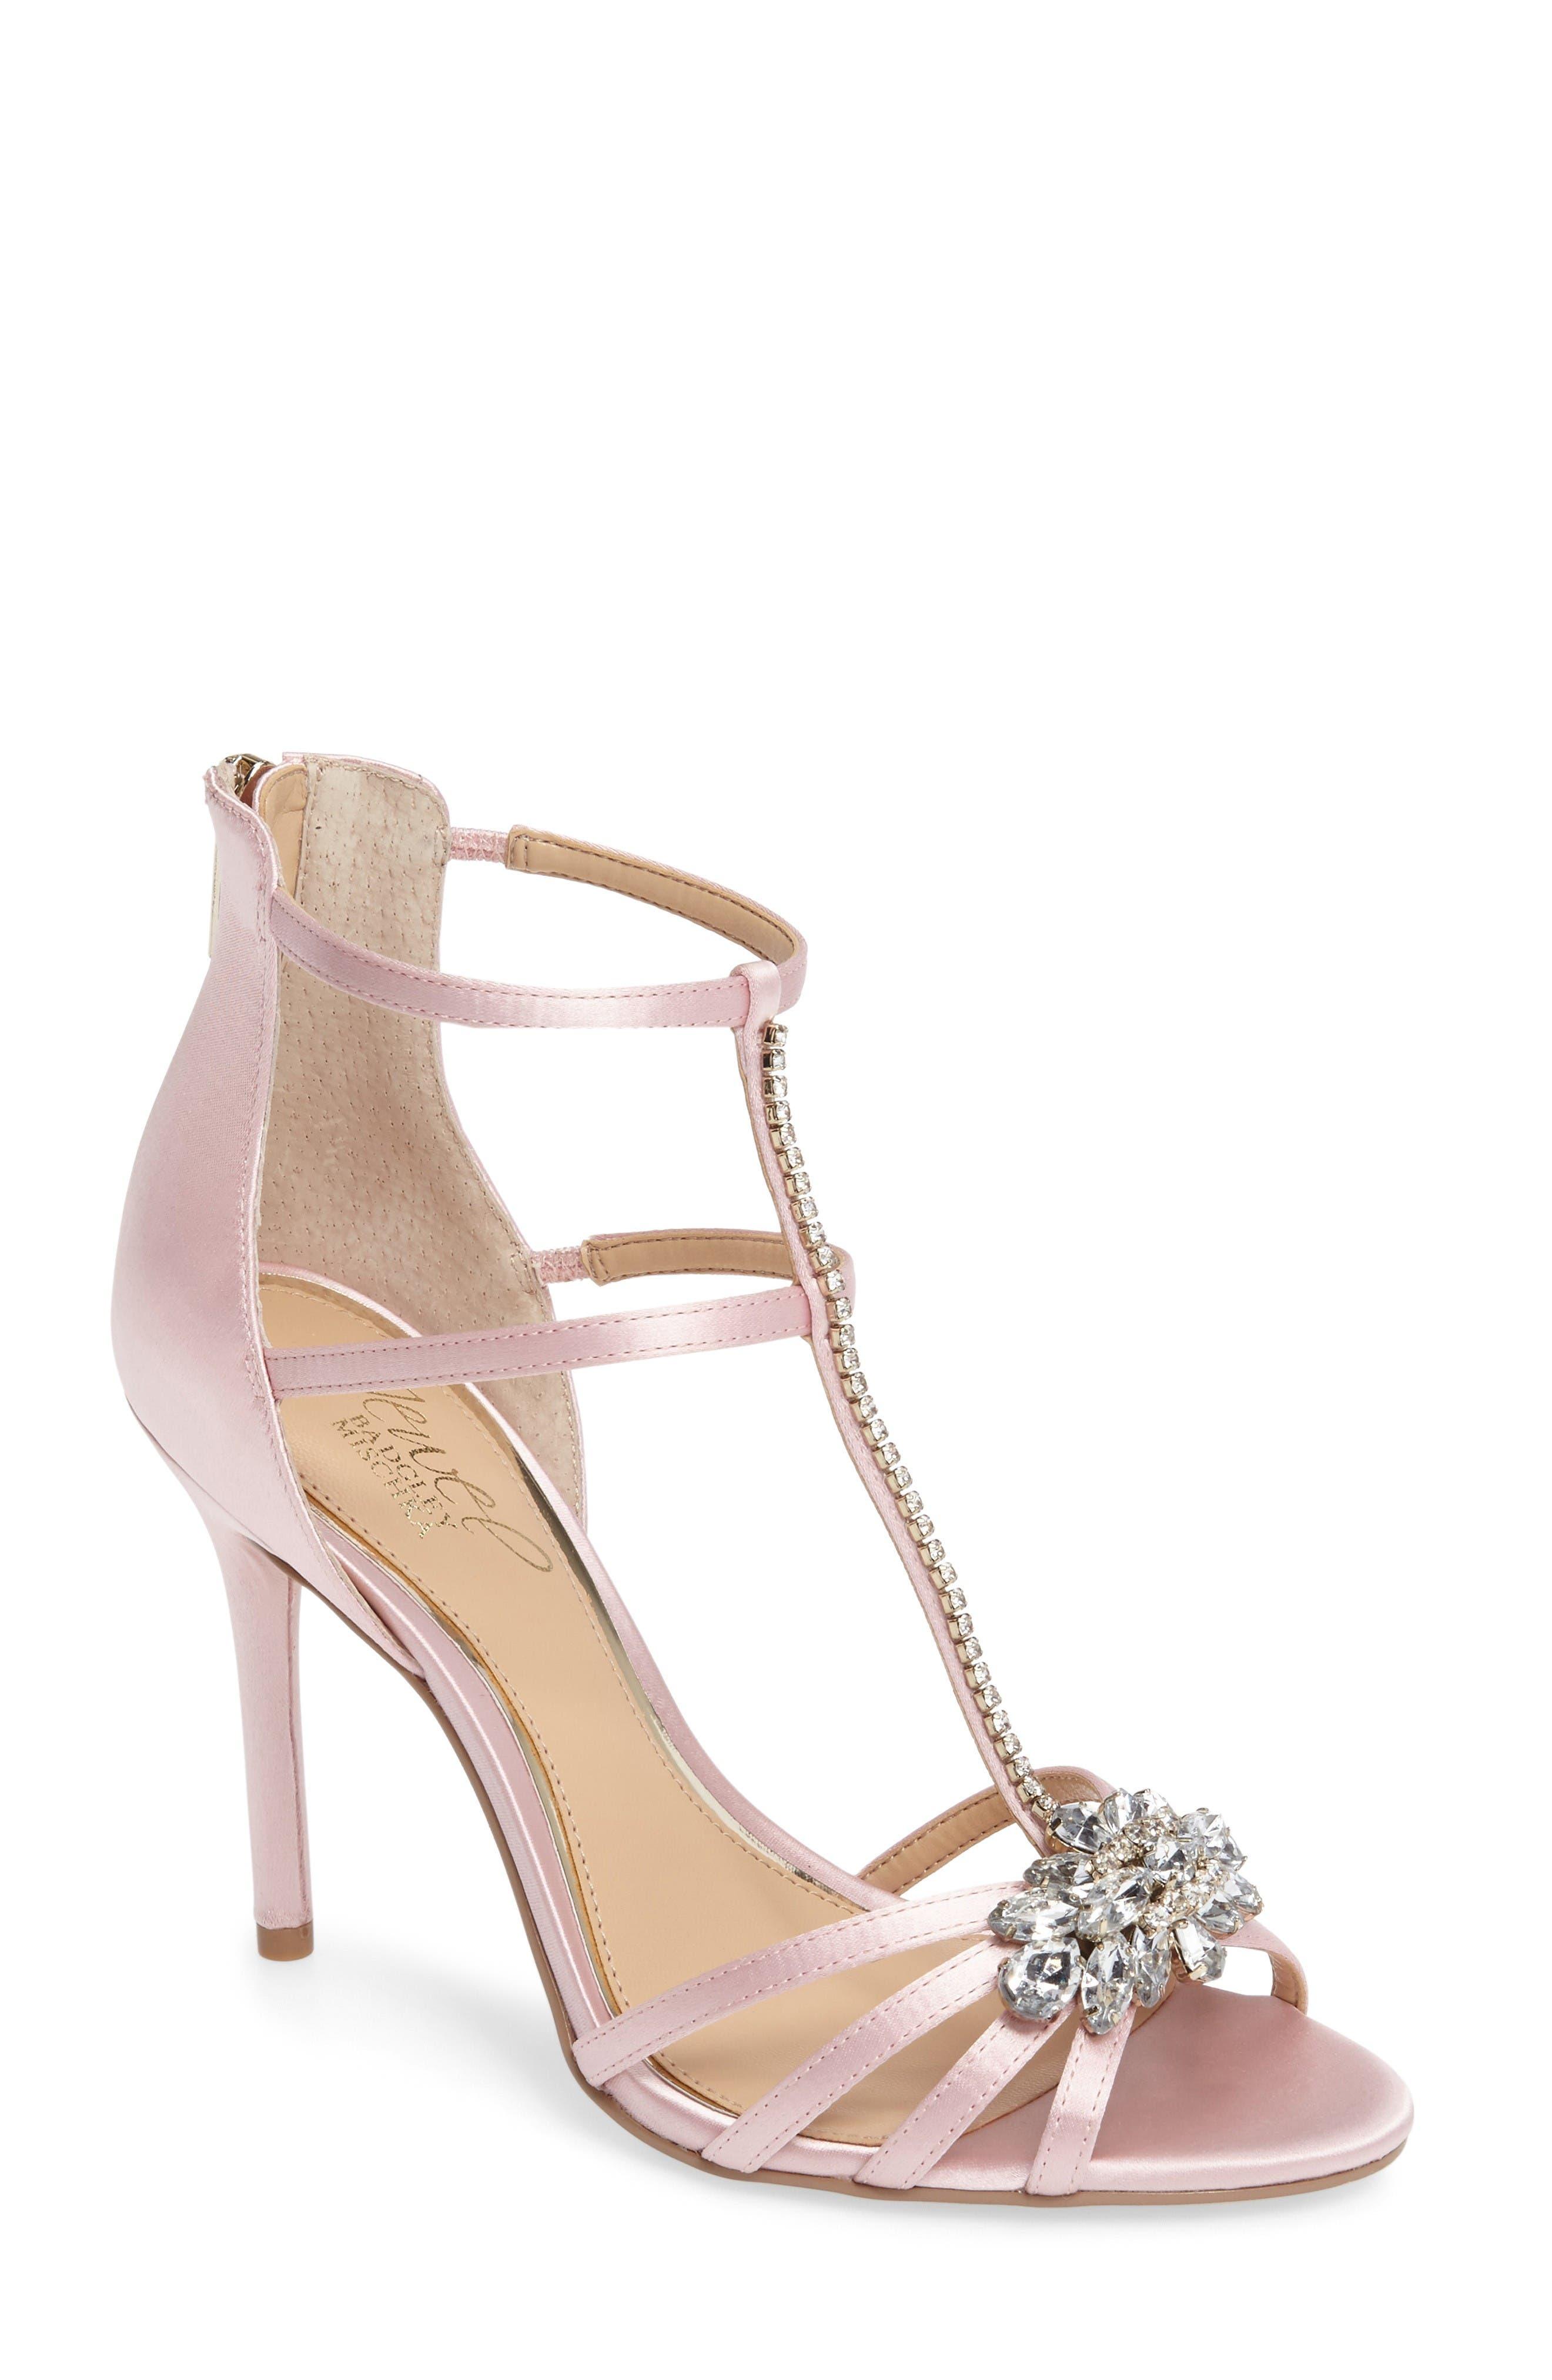 Alternate Image 1 Selected - Jewel Badgley Mischka Hazel Embellished T-Strap Sandal (Women)